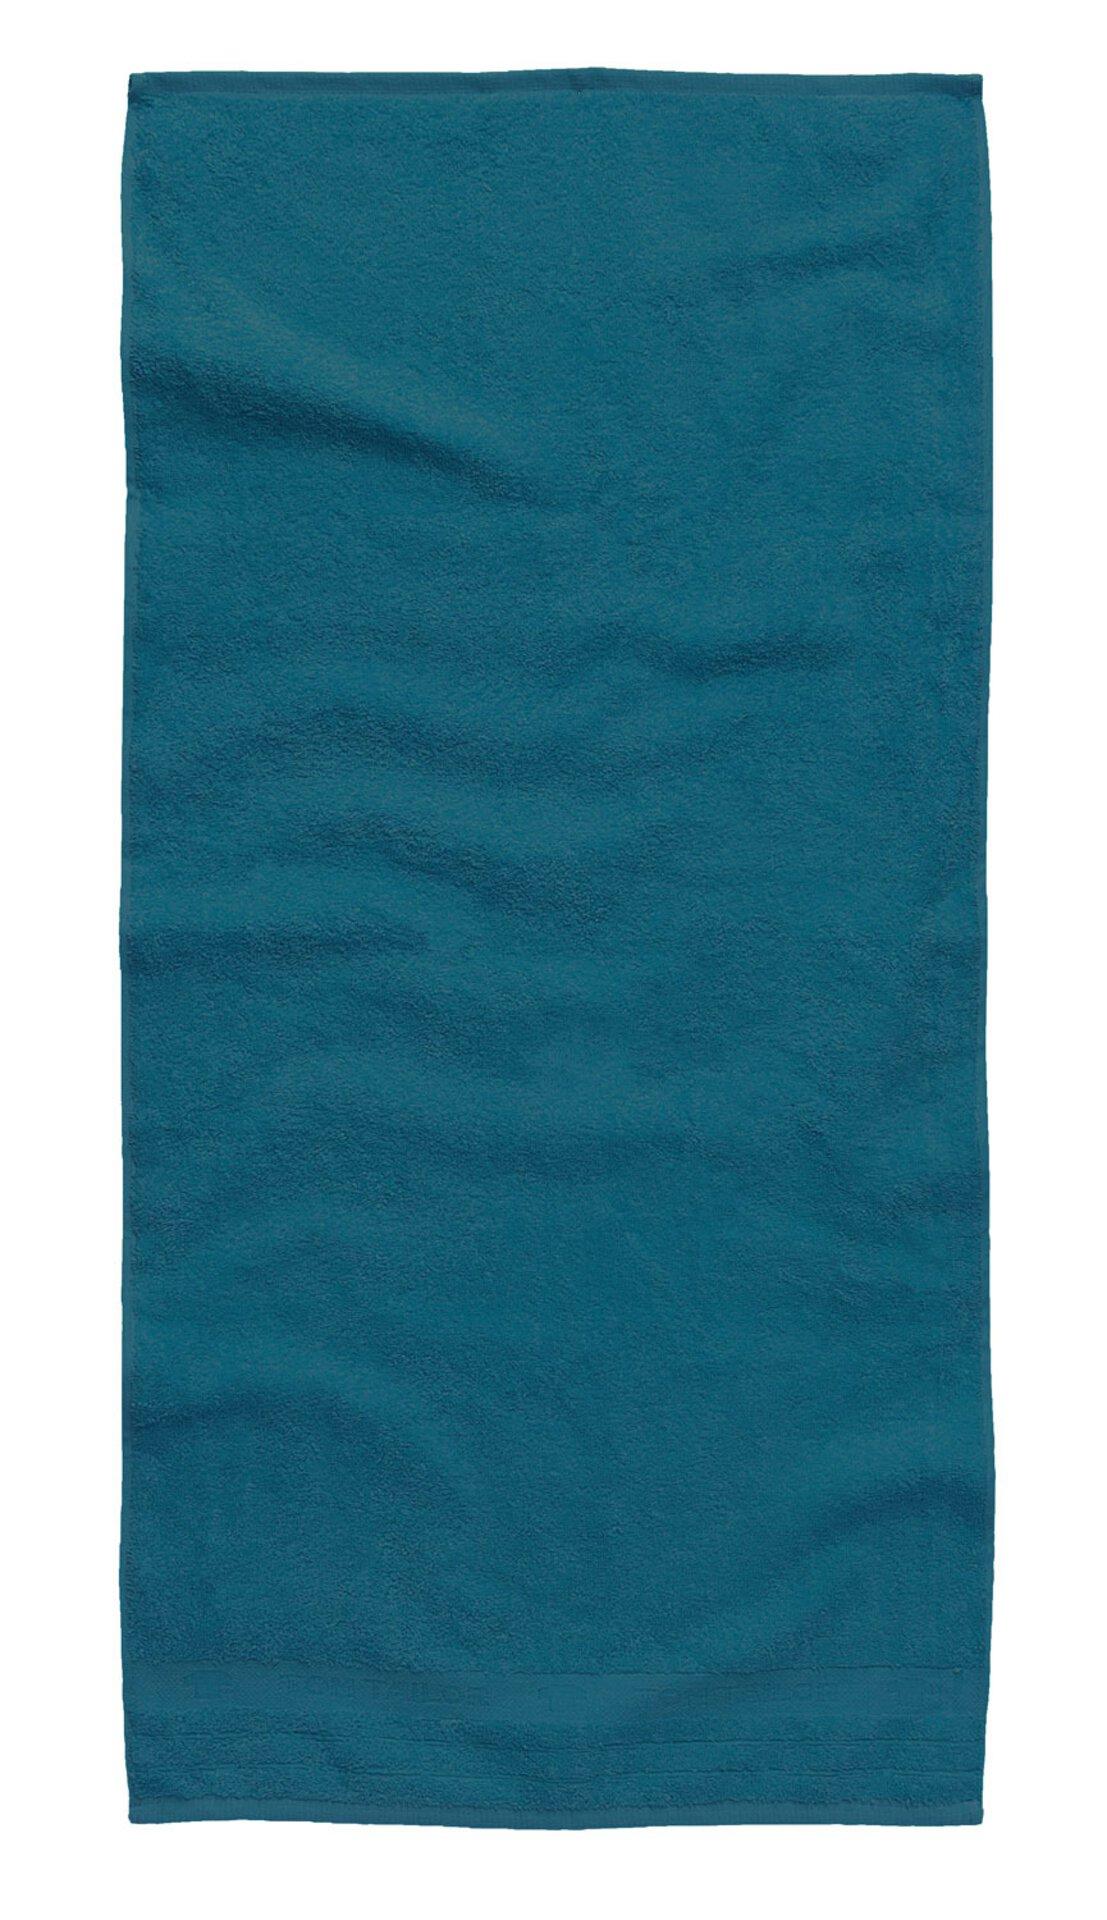 Handtuch Uni Towel Tom Tailor Textil Blau 50 x 100 cm